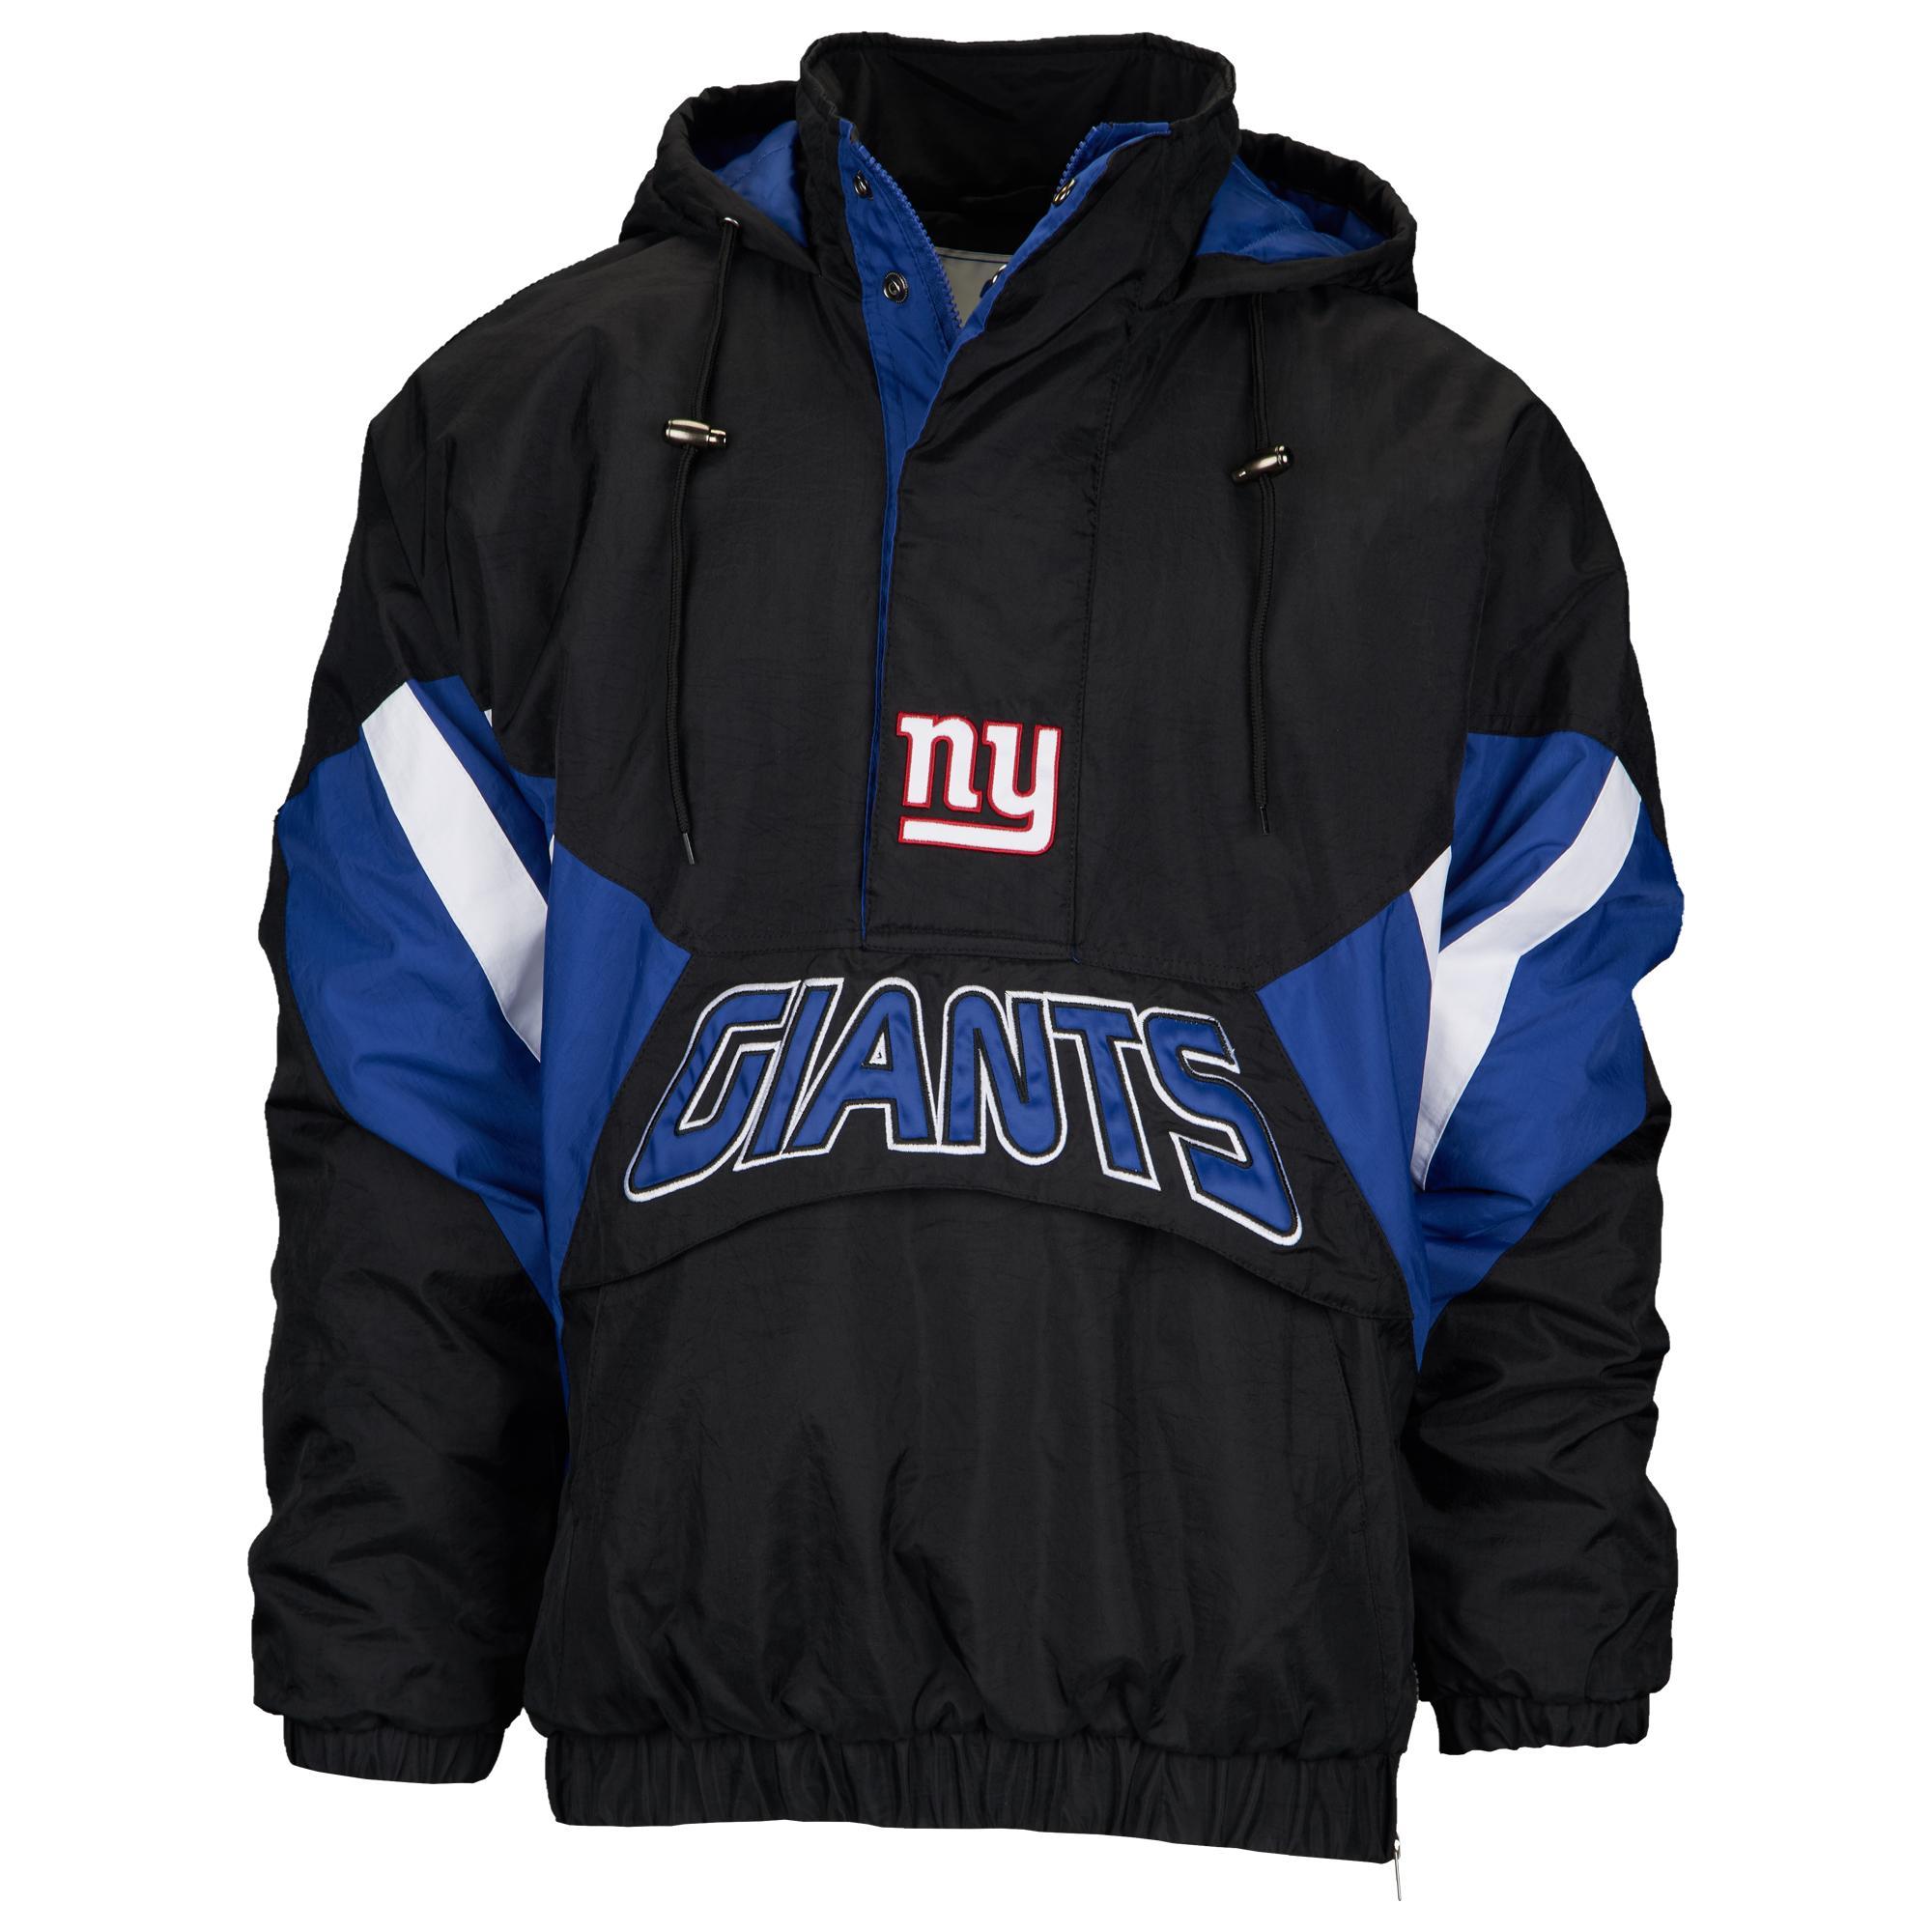 efe8f88b Starter New York Giants Nfl 1/2 Zip Hooded Pullover Jacket in Black ...